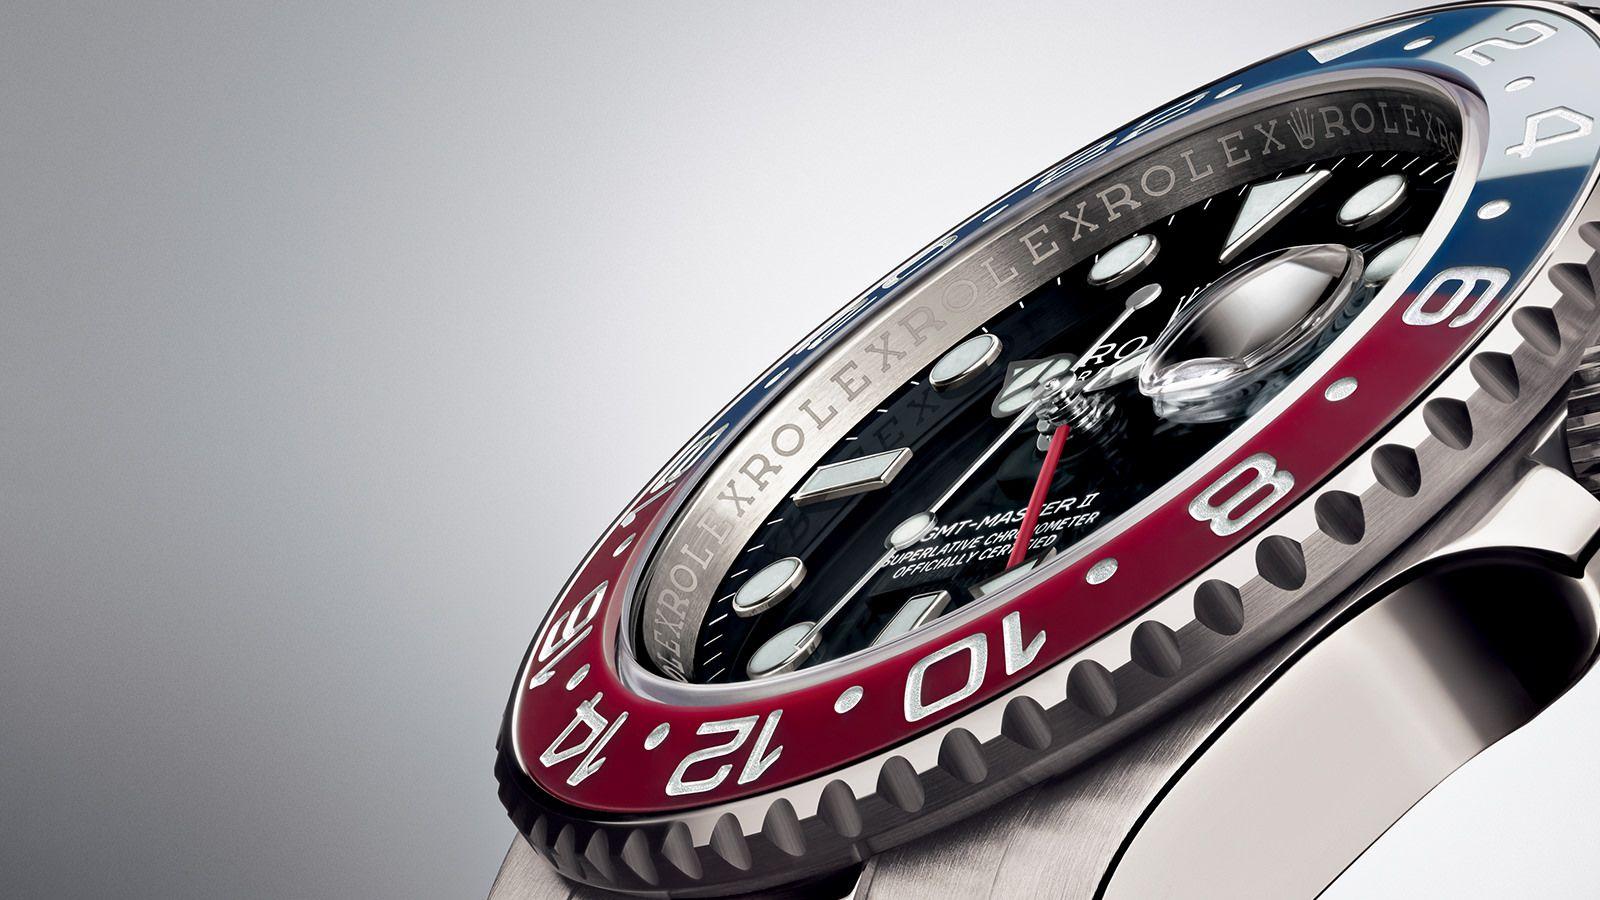 Rolex-GMT-II-Pepsi-GP100-Gear-Patorl-Lead-Full-Left